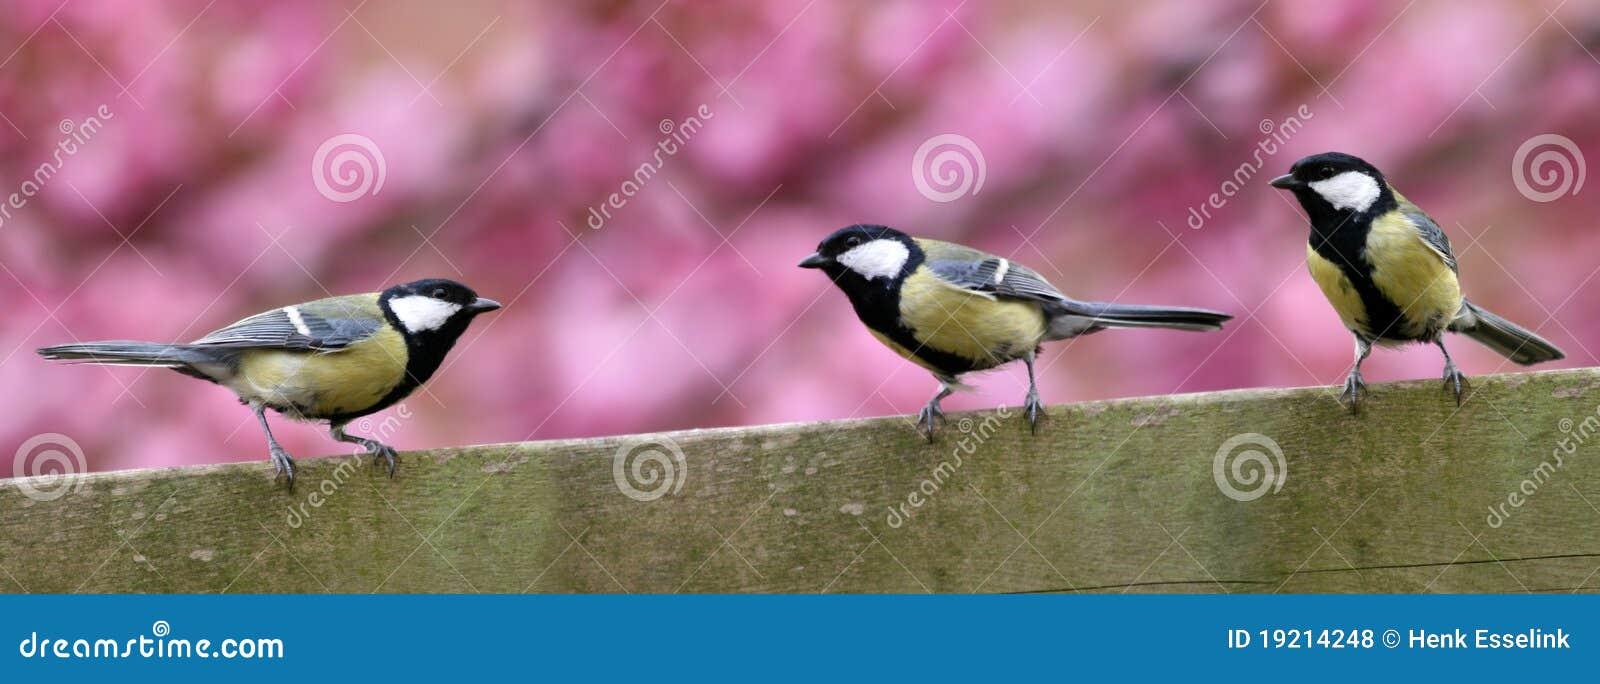 Three garden birds on fence